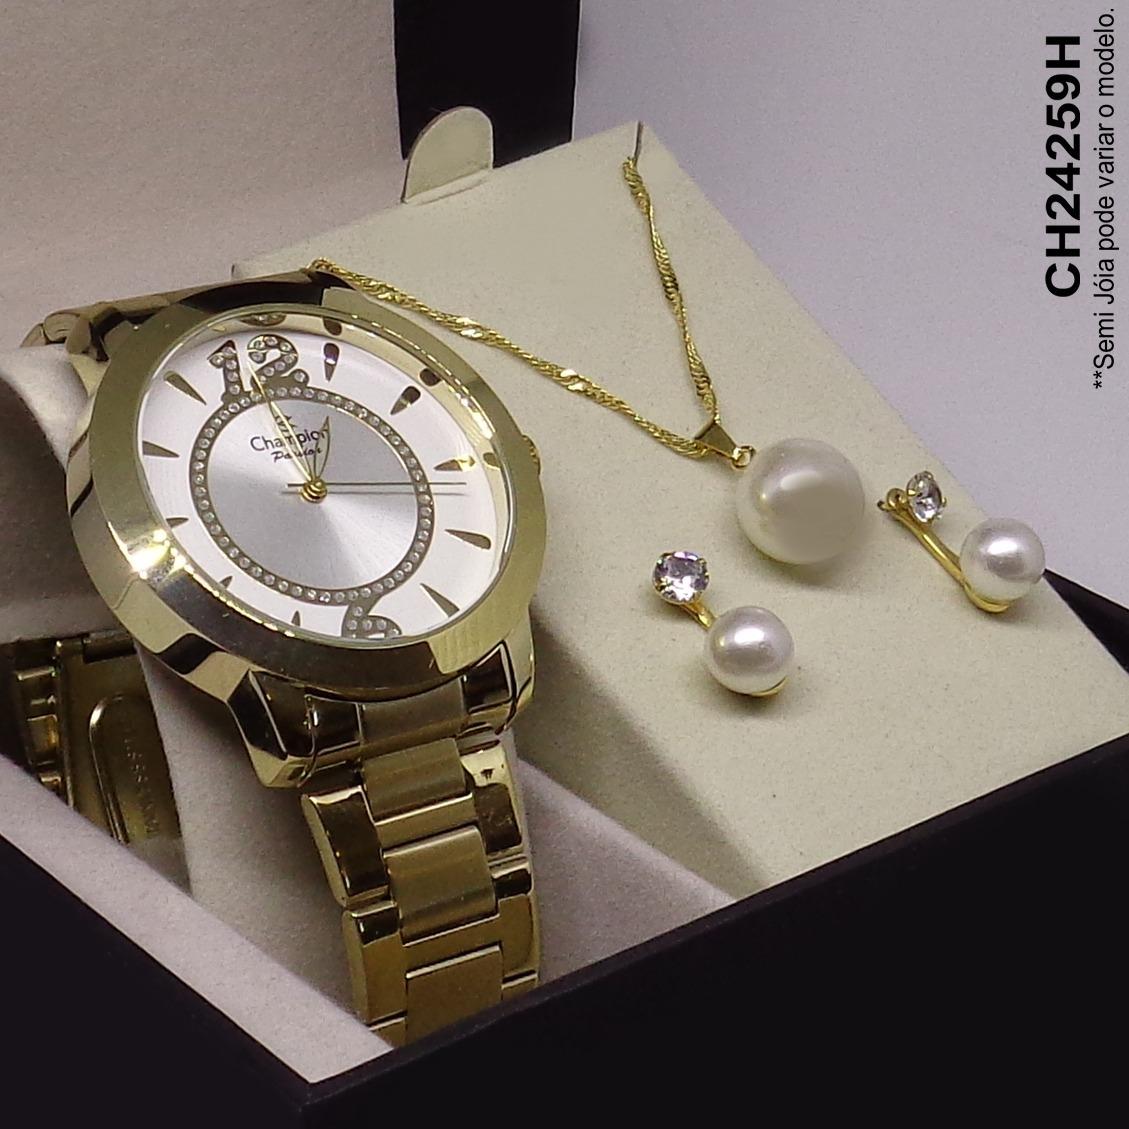 88d53295498 relógio champion feminino passion ch24259h + kit brinde vip. Carregando  zoom.